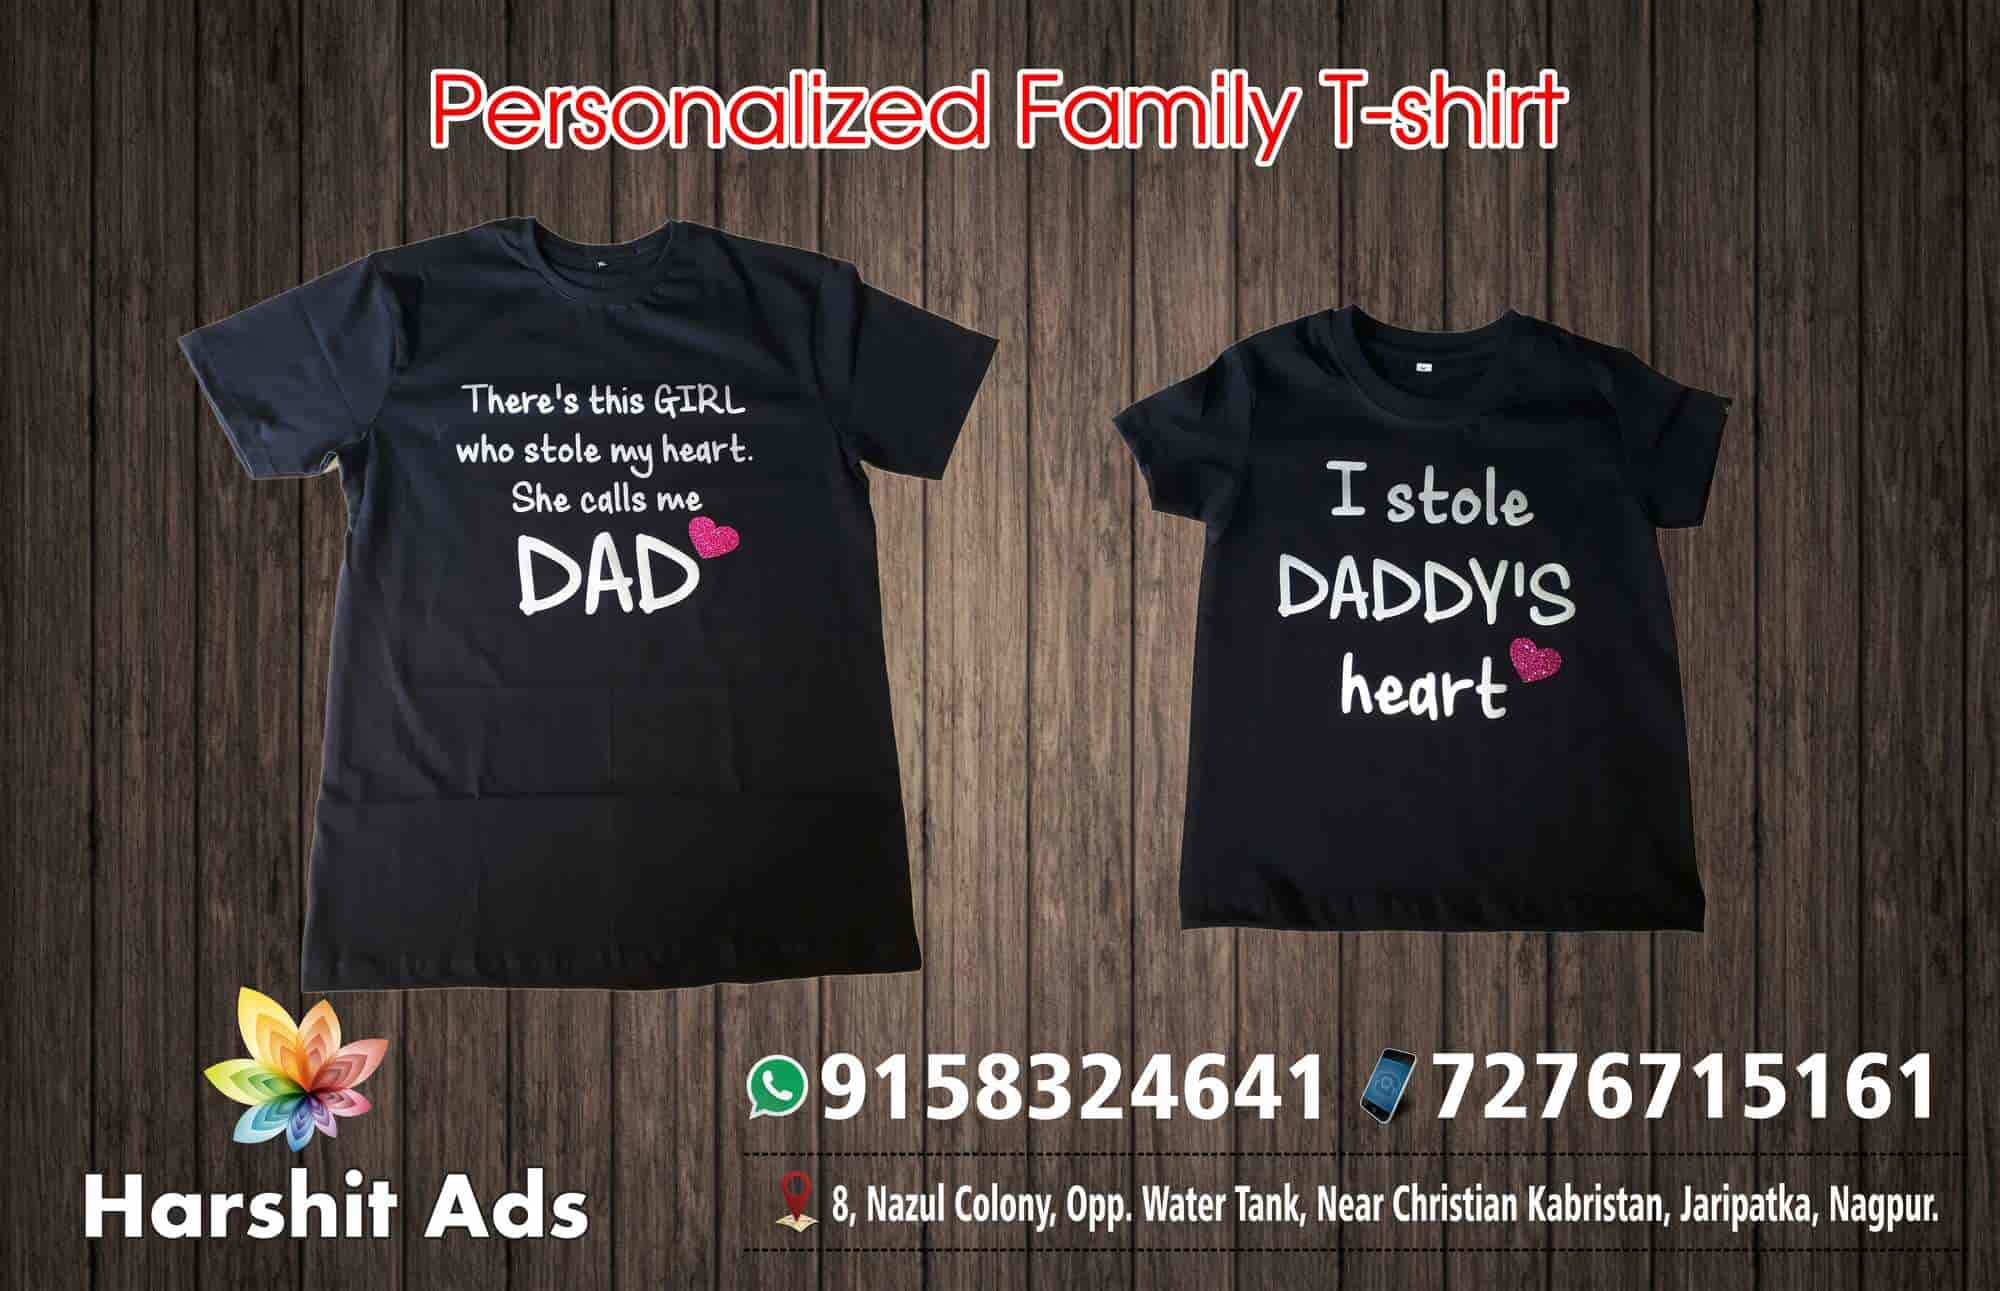 Harshit Ads, Jaripatka - T Shirt Printers in Nagpur - Justdial